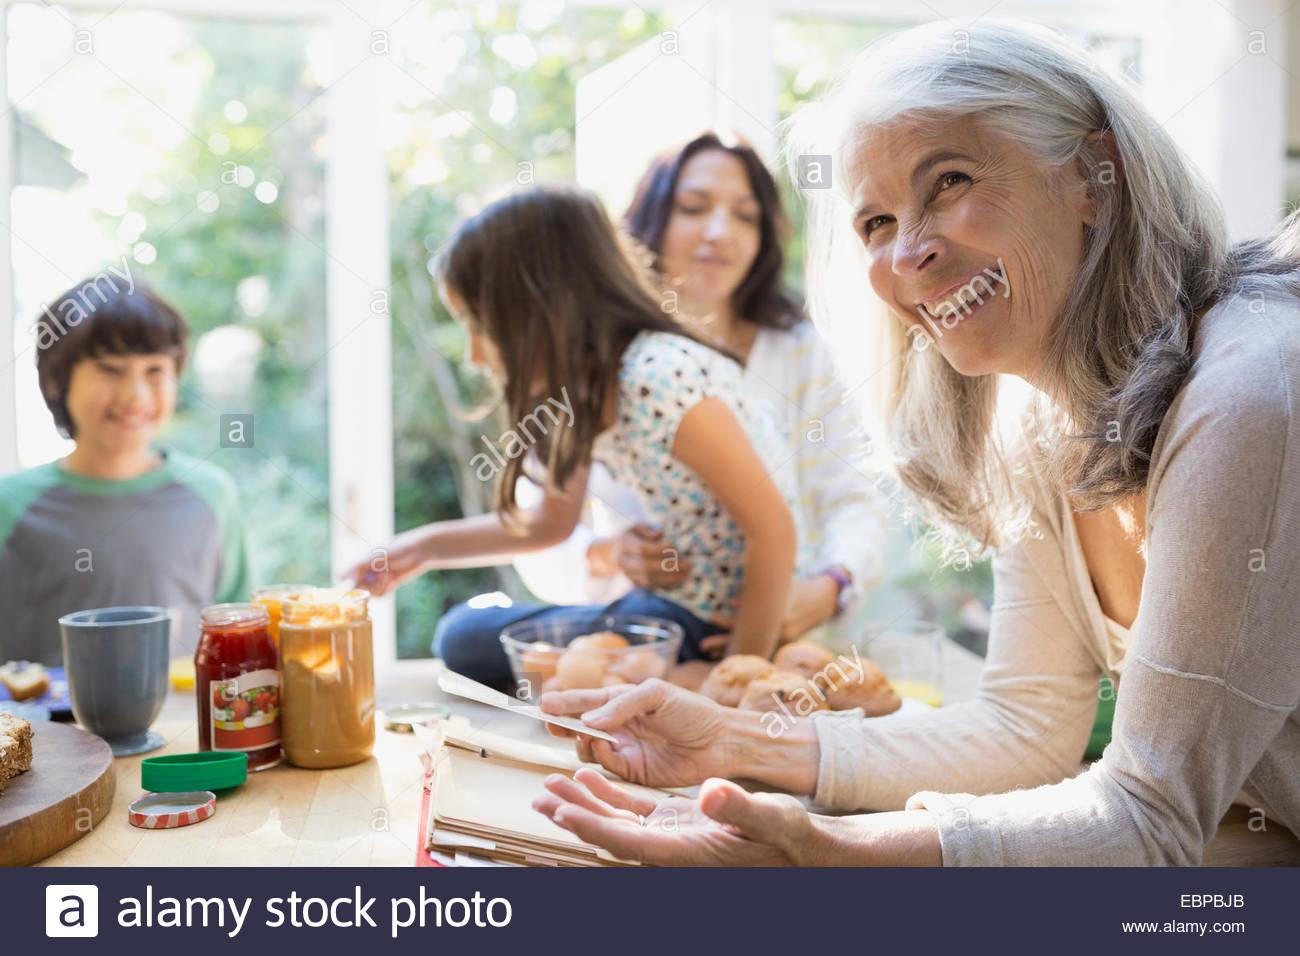 Multi-generation family in kitchen Photo Stock